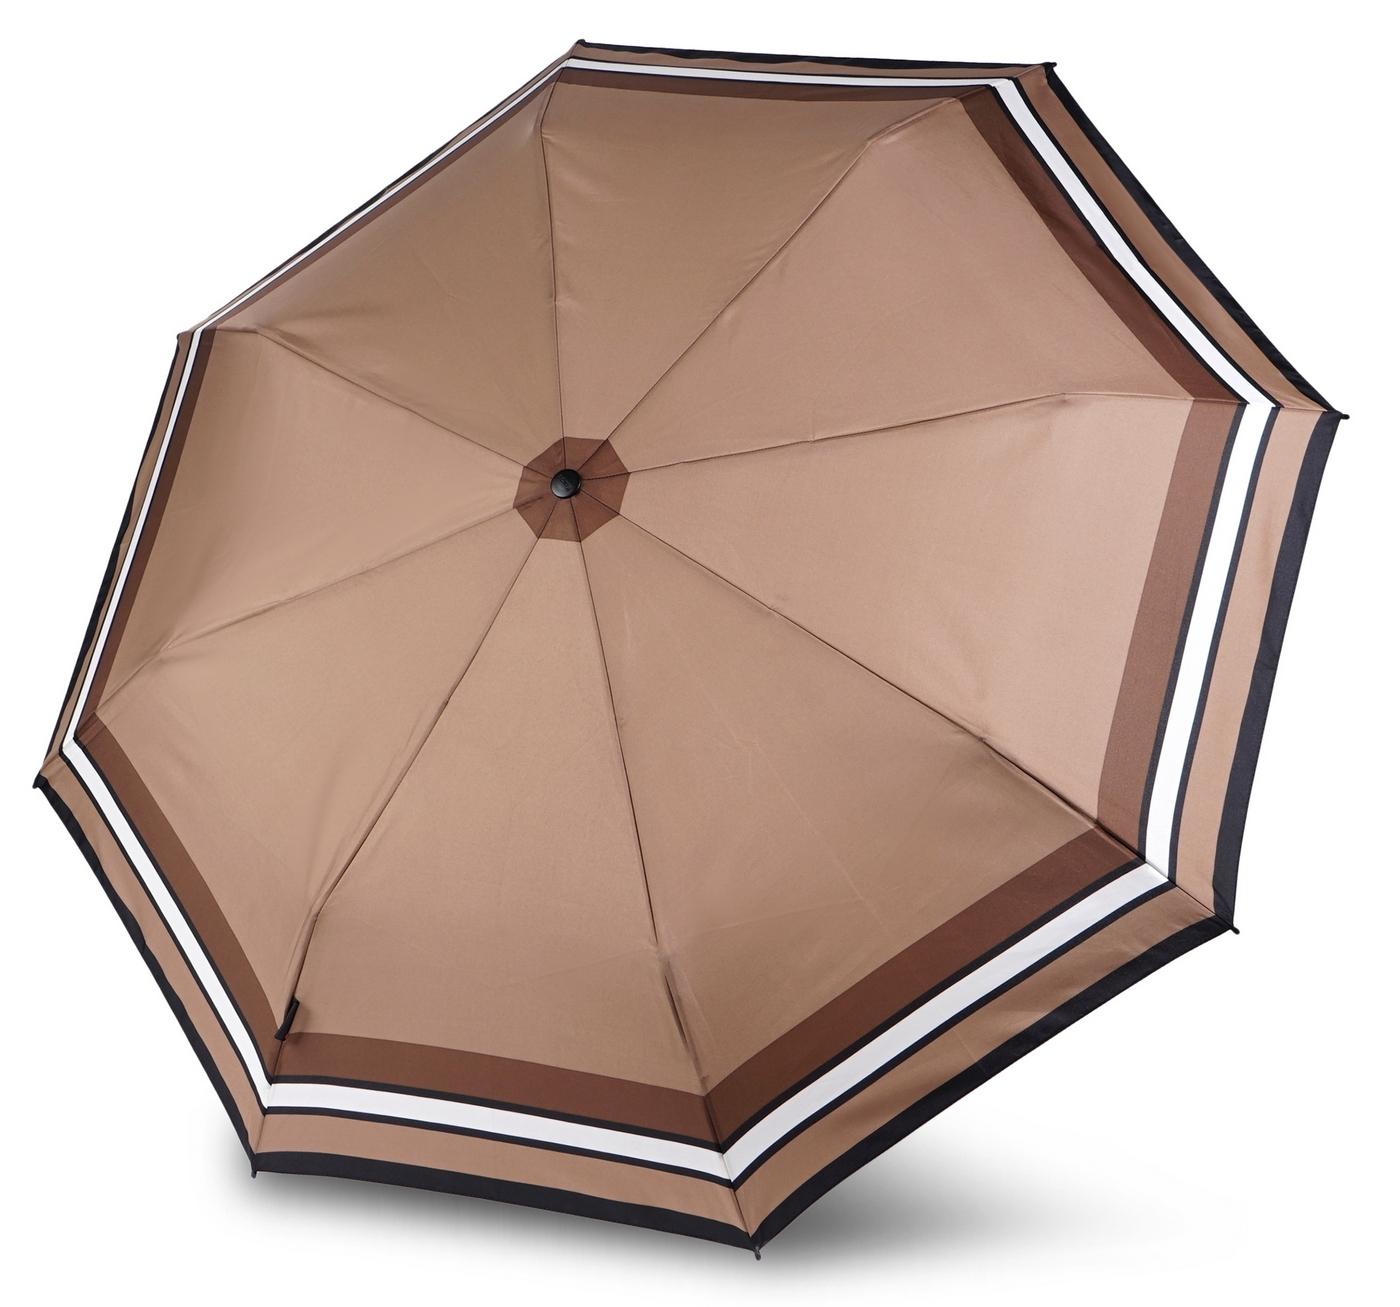 Зонт Knirps 95 3200 4943, коричневый зонты